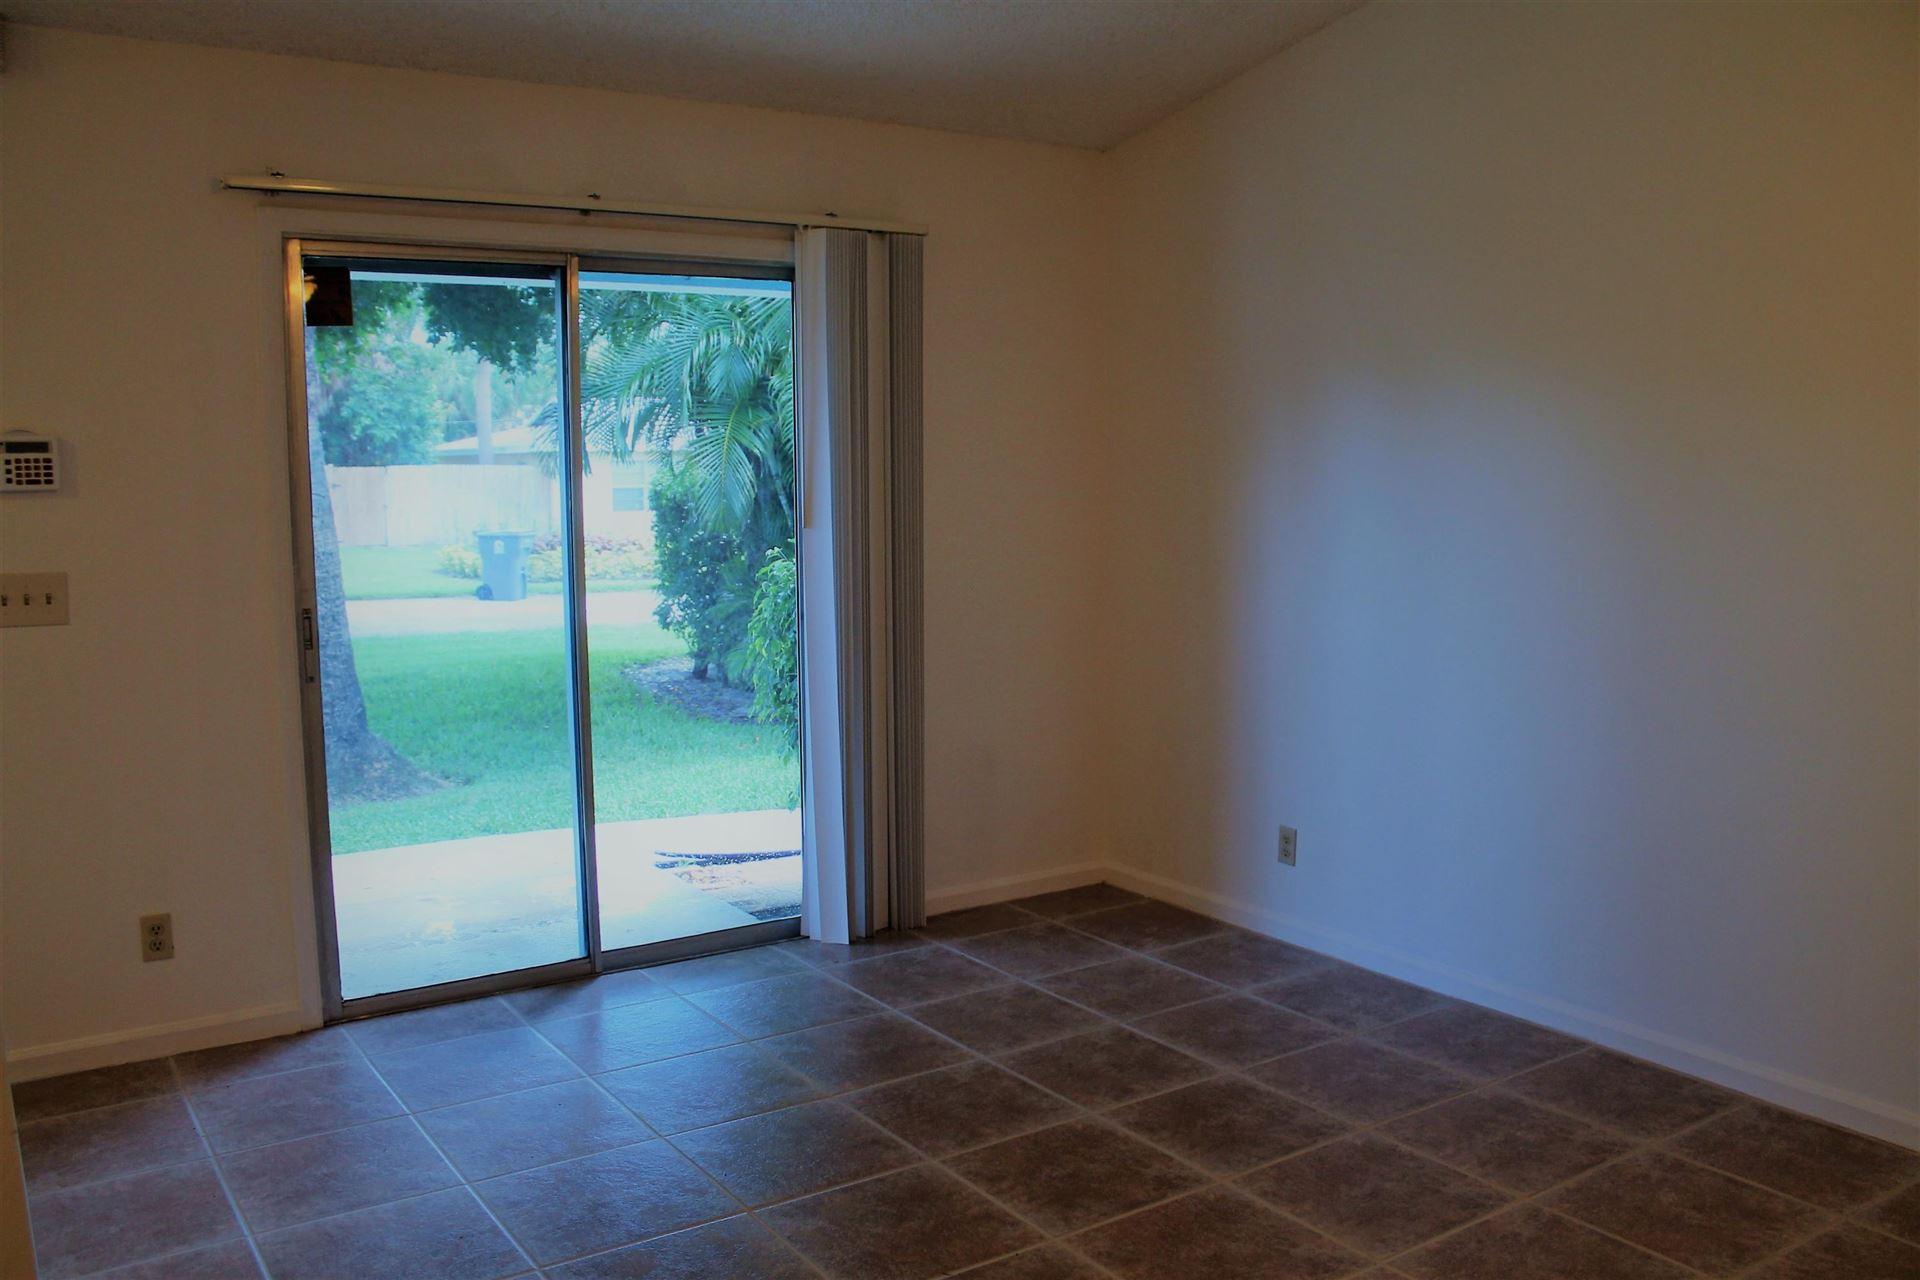 Photo of 1874 Windsor Drive, North Palm Beach, FL 33408 (MLS # RX-10729790)